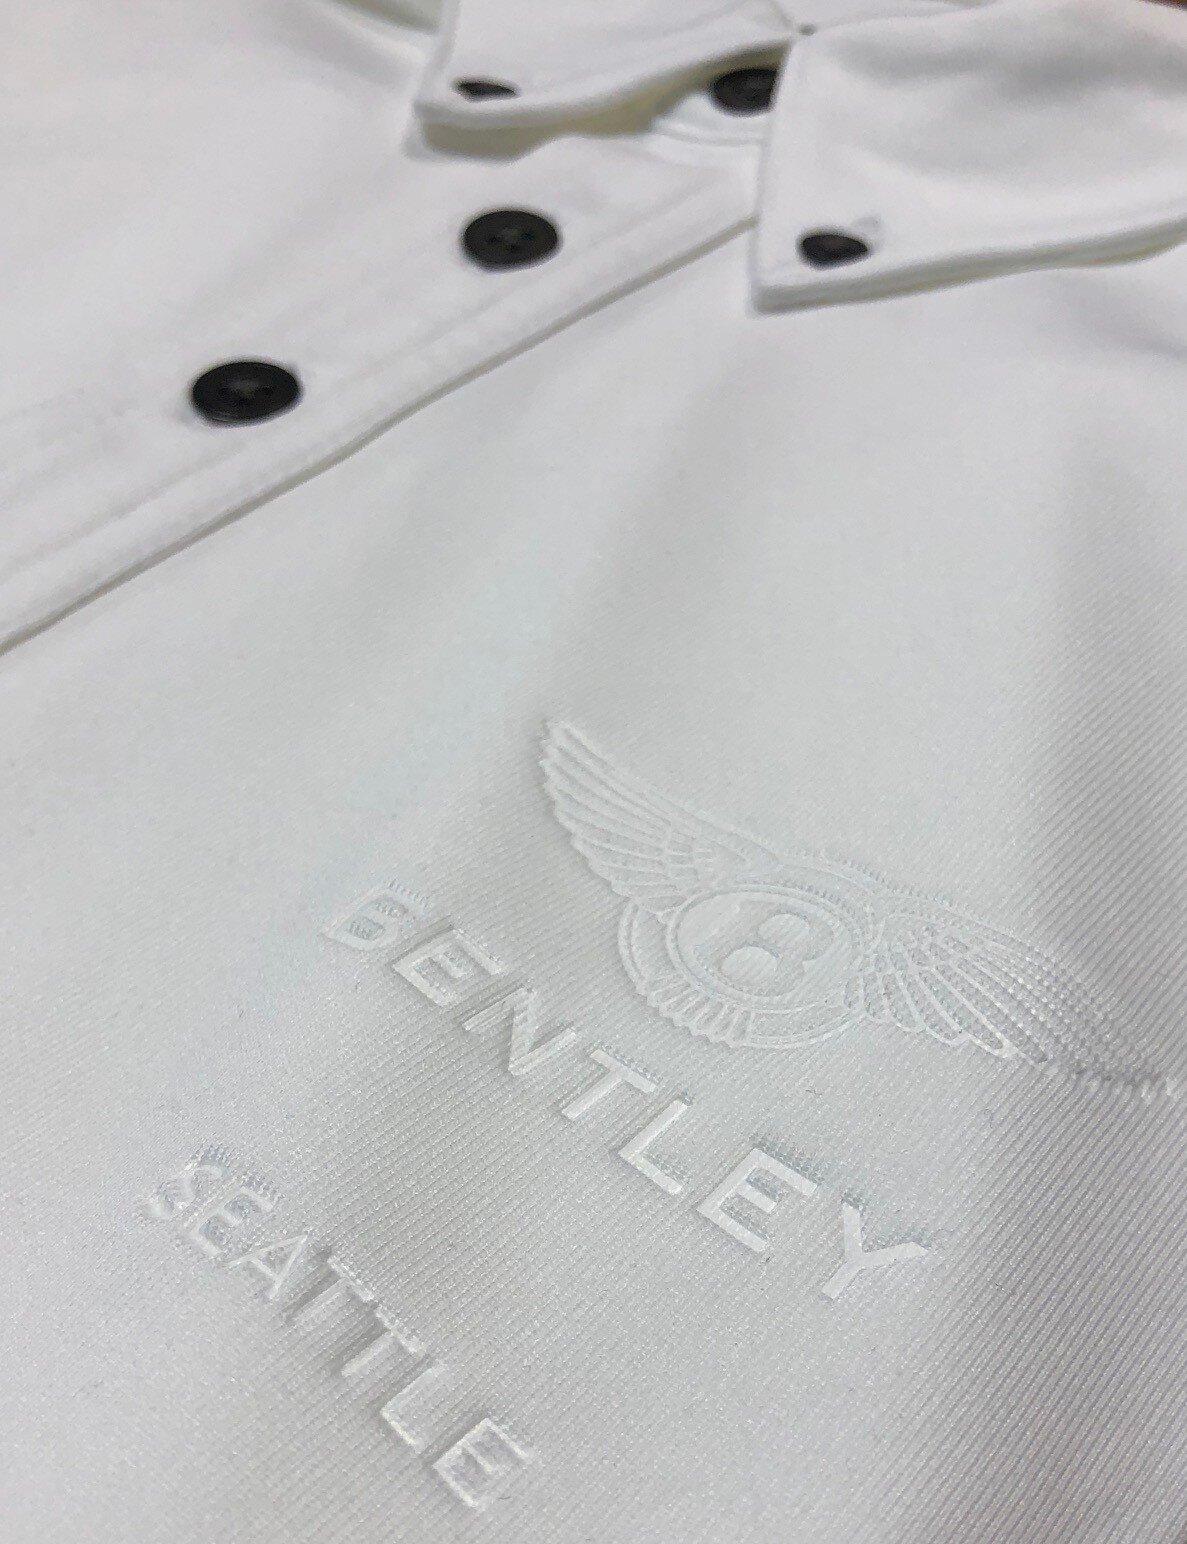 logounltd_laser_etching_embroidery_screen_printing_apparel_uniform_custom_tshirts_t_shirt_kirkland_bellevue_seattle_redmond_woodinville_branded_merchandise_promotional_products_logo_unltd_deboss_bentley (4).jpg